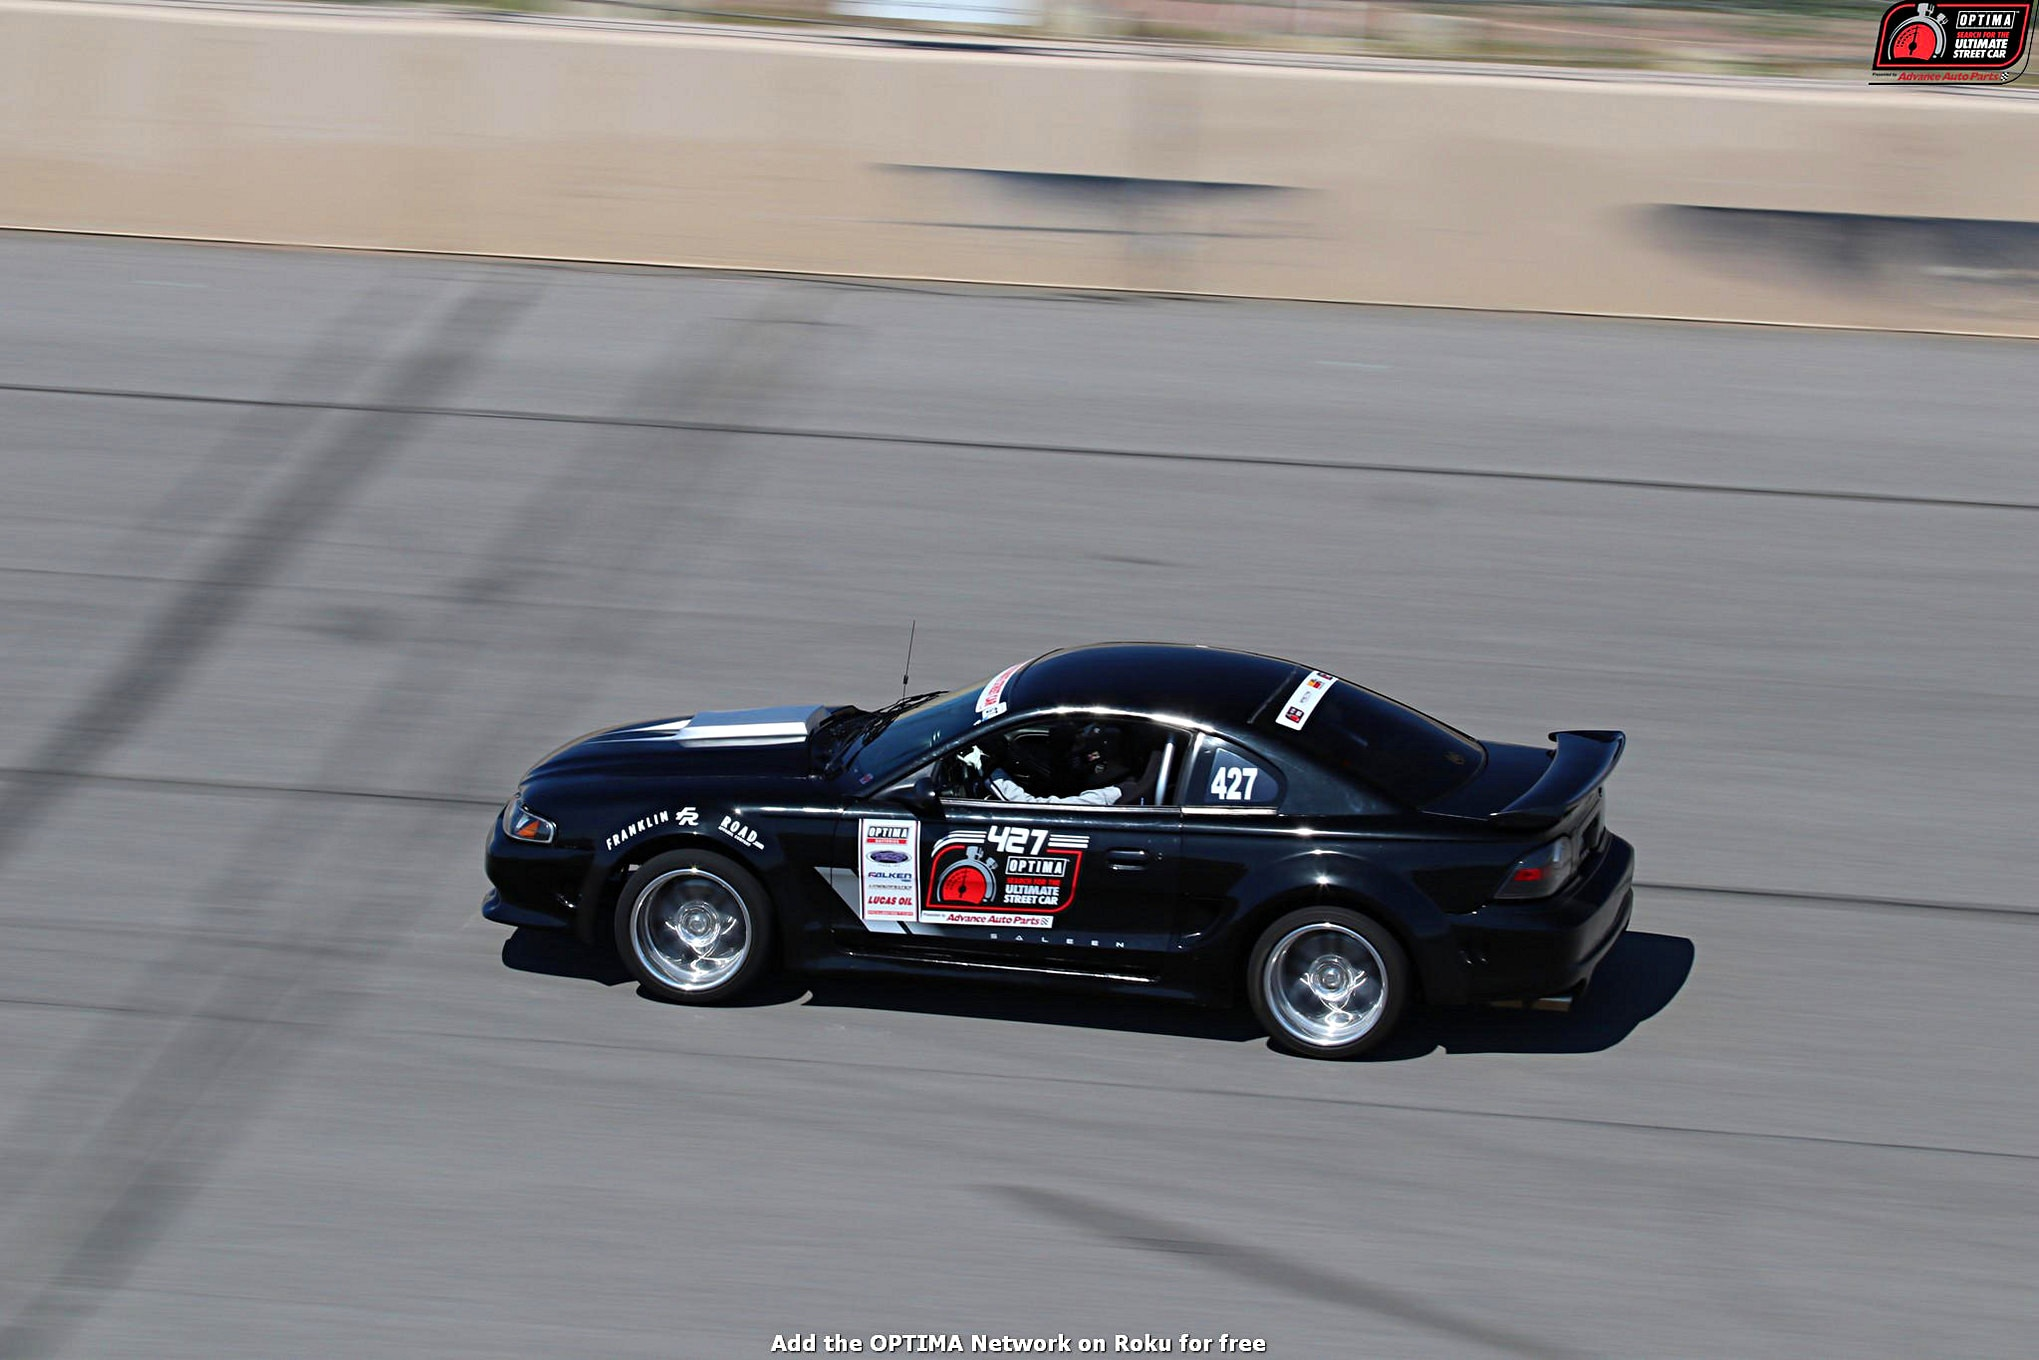 Trevor Systma 1996 Ford Mustang DriveOPTIMA Pikes Peak International Raceway 2018 166